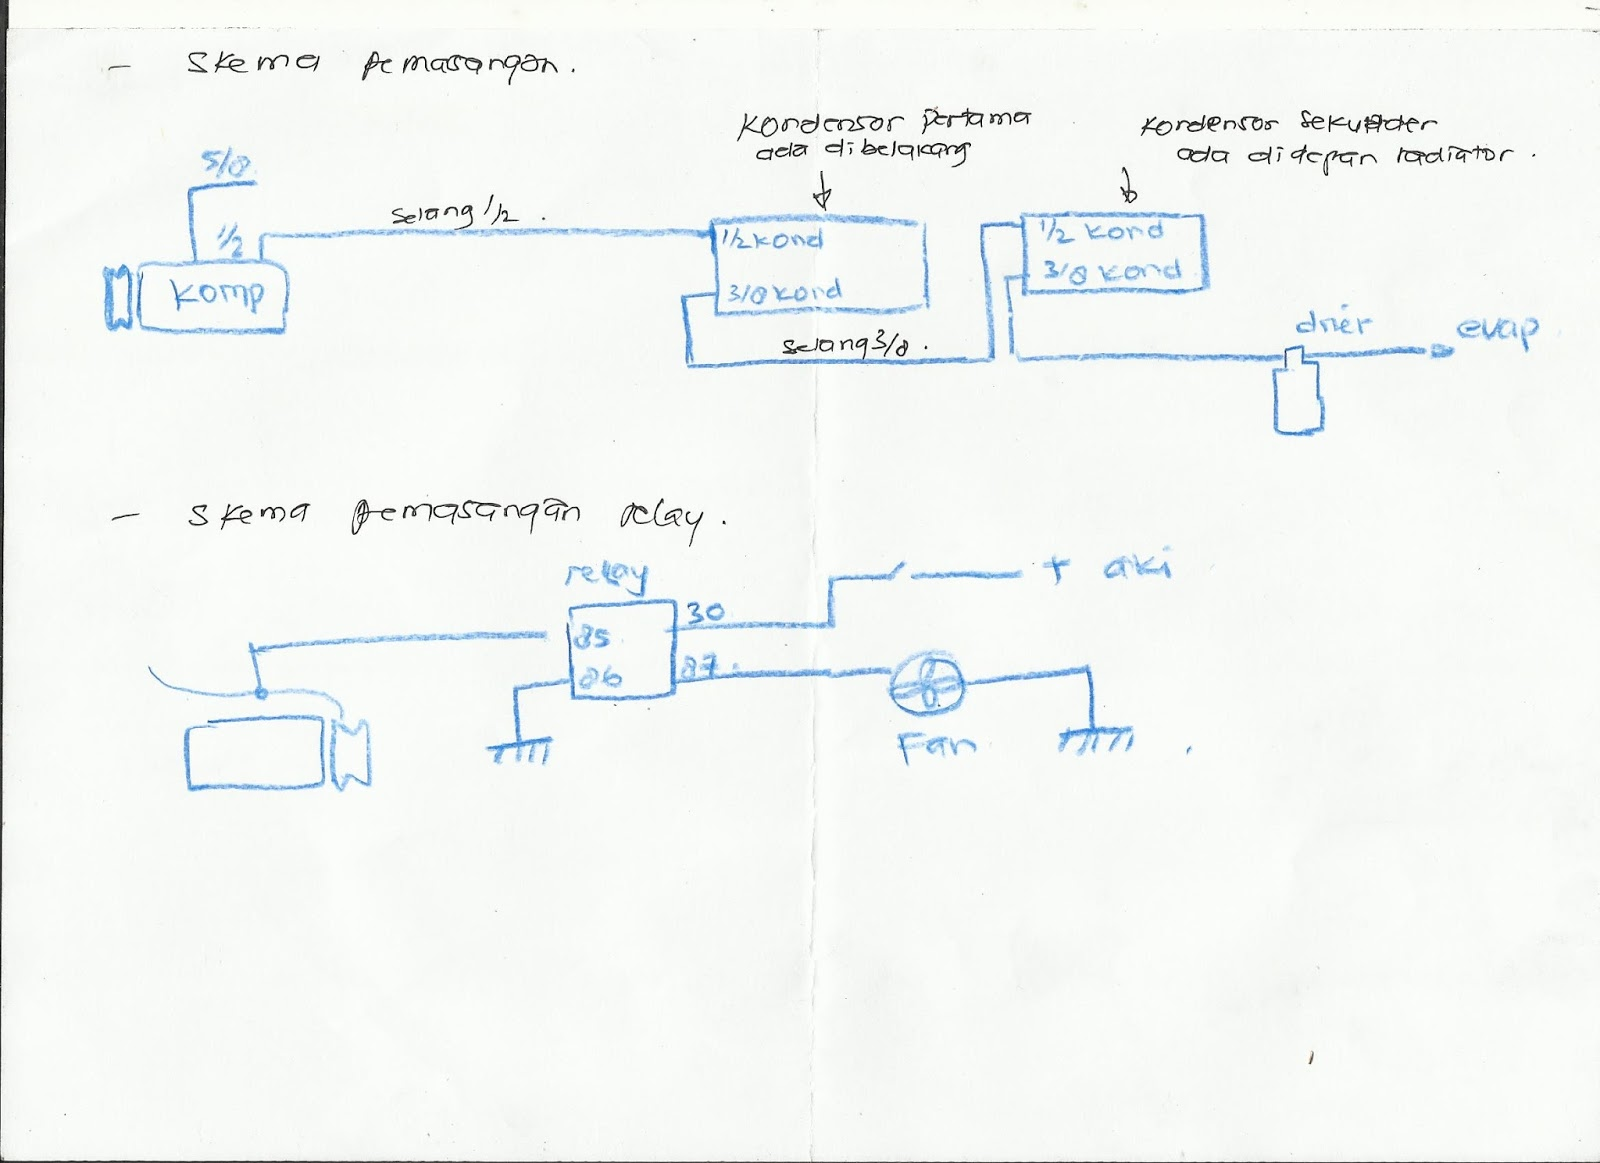 Rangkaian wiring sederhana dan pengukurannya spesialis ac mobil rangkaian wiring sederhana dan pengukurannya cheapraybanclubmaster Choice Image